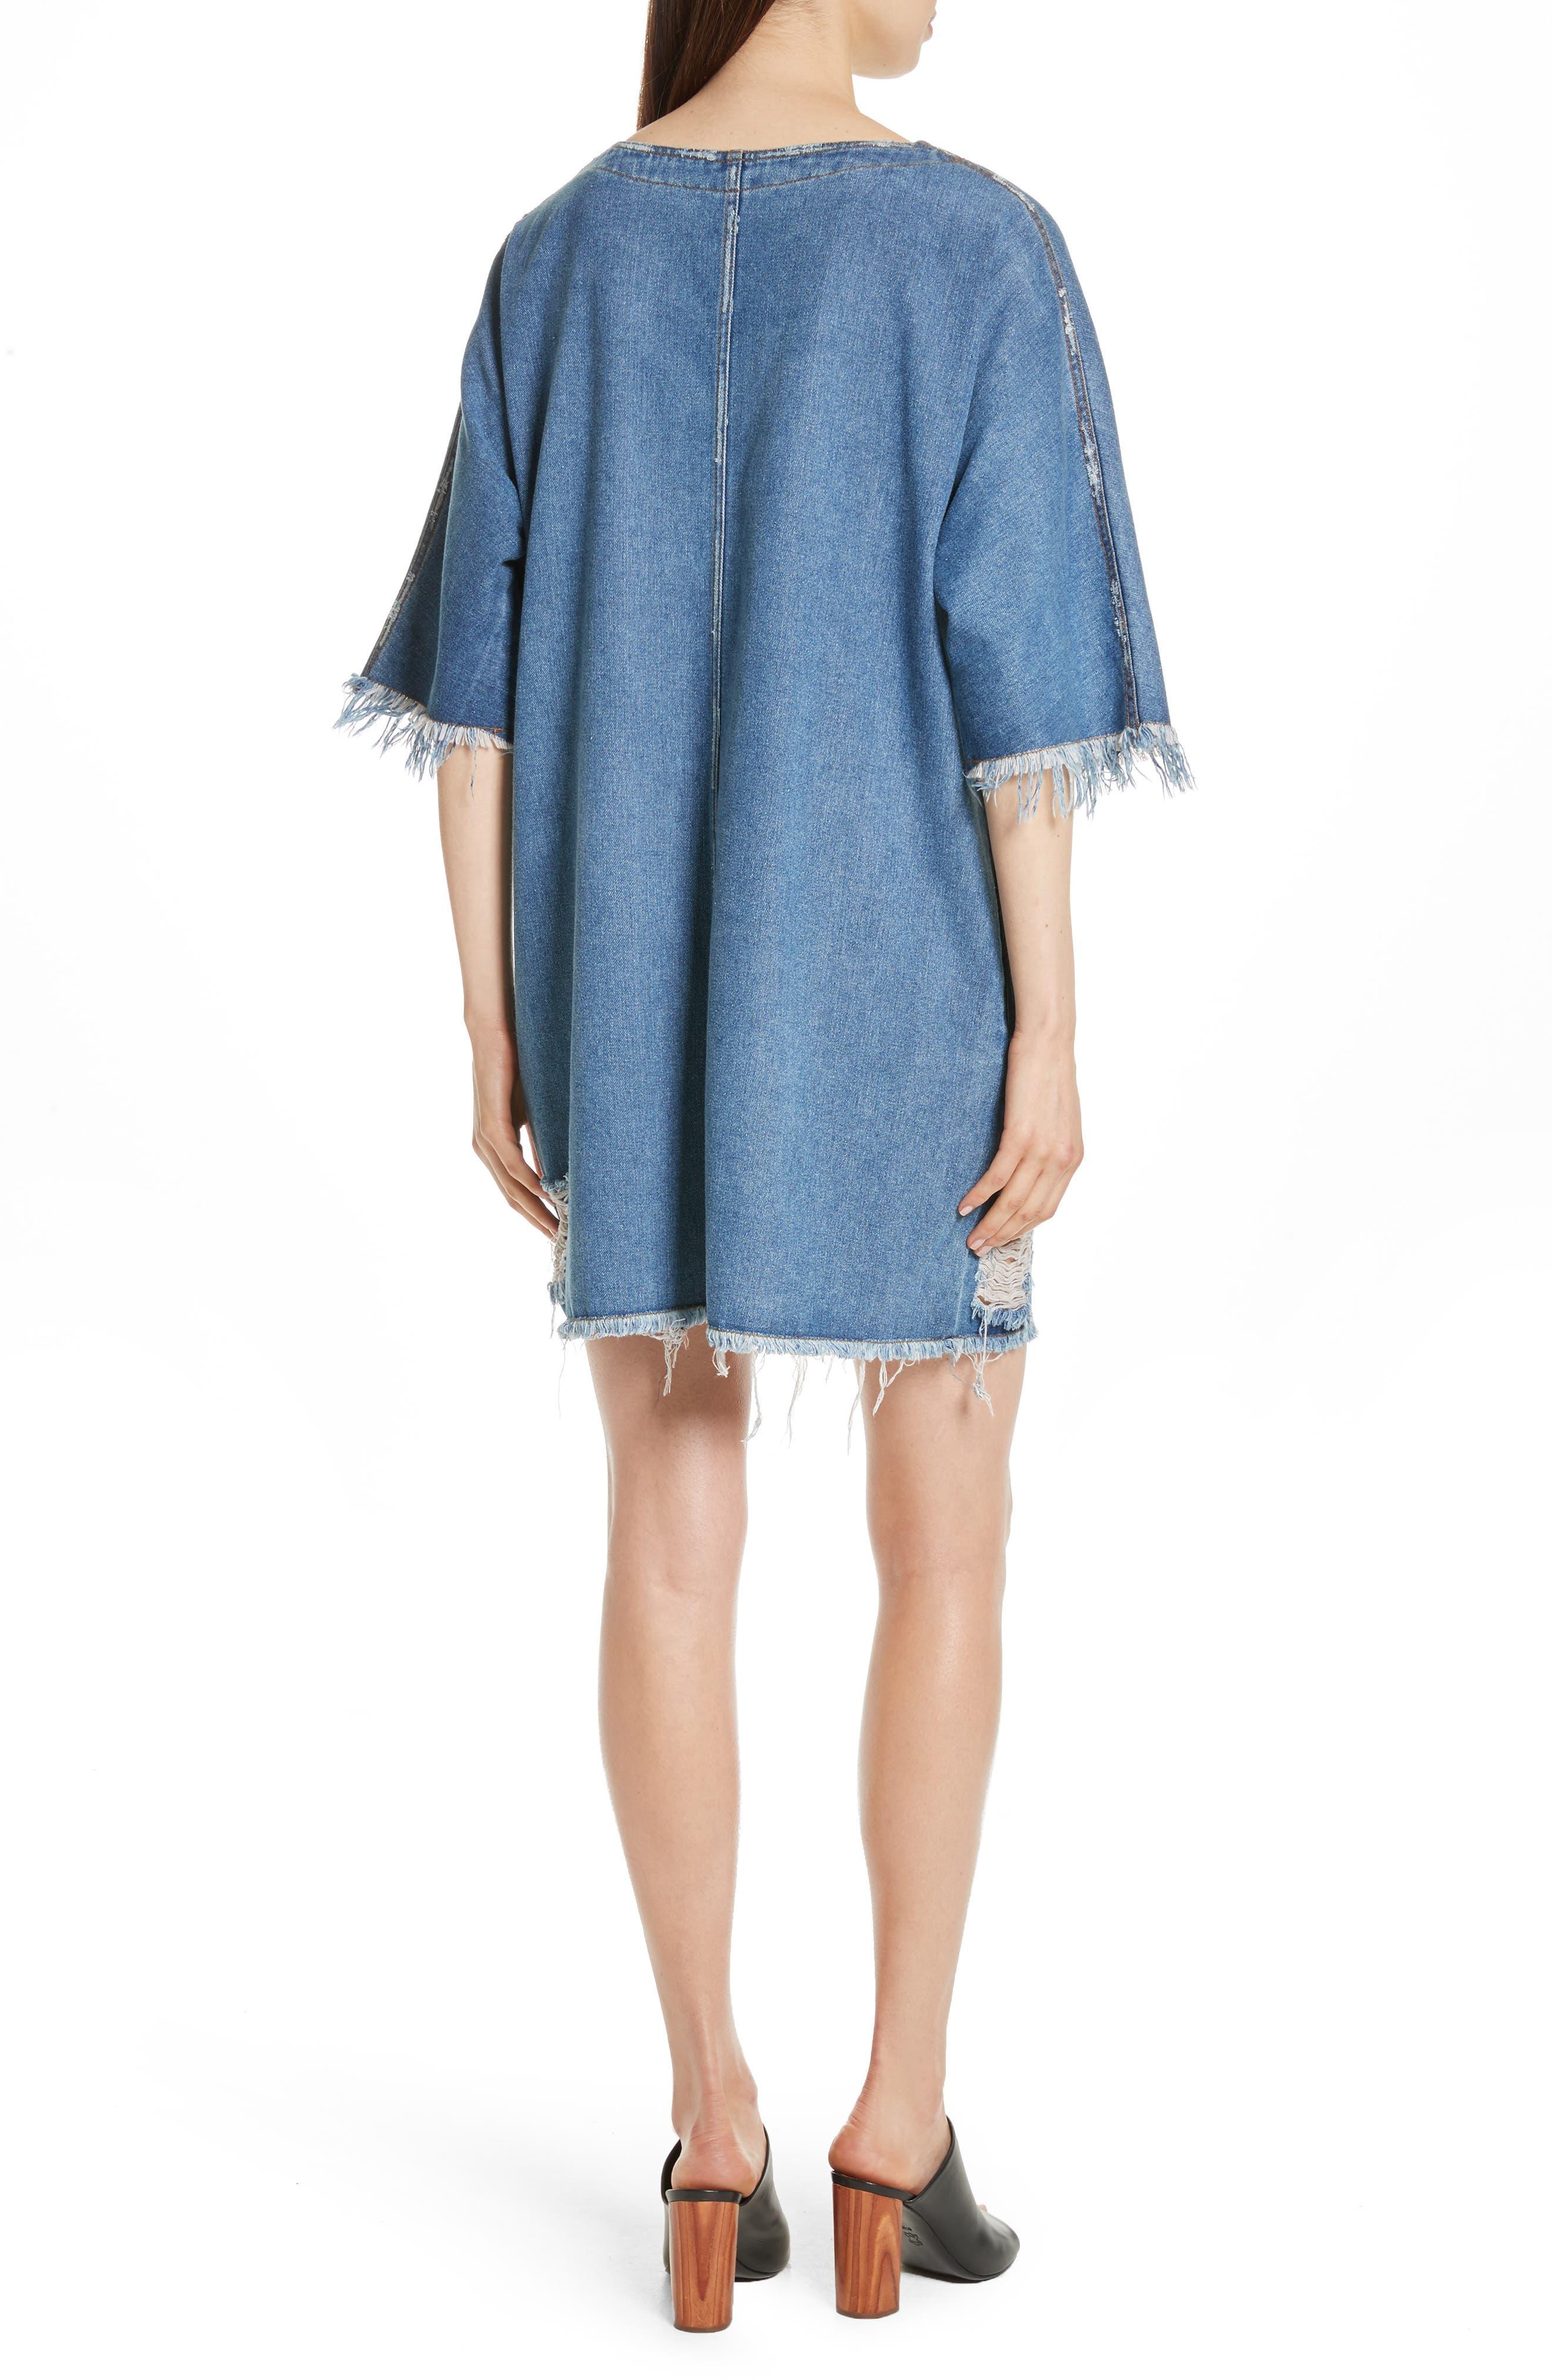 Distressed Denim Dress,                             Alternate thumbnail 2, color,                             400